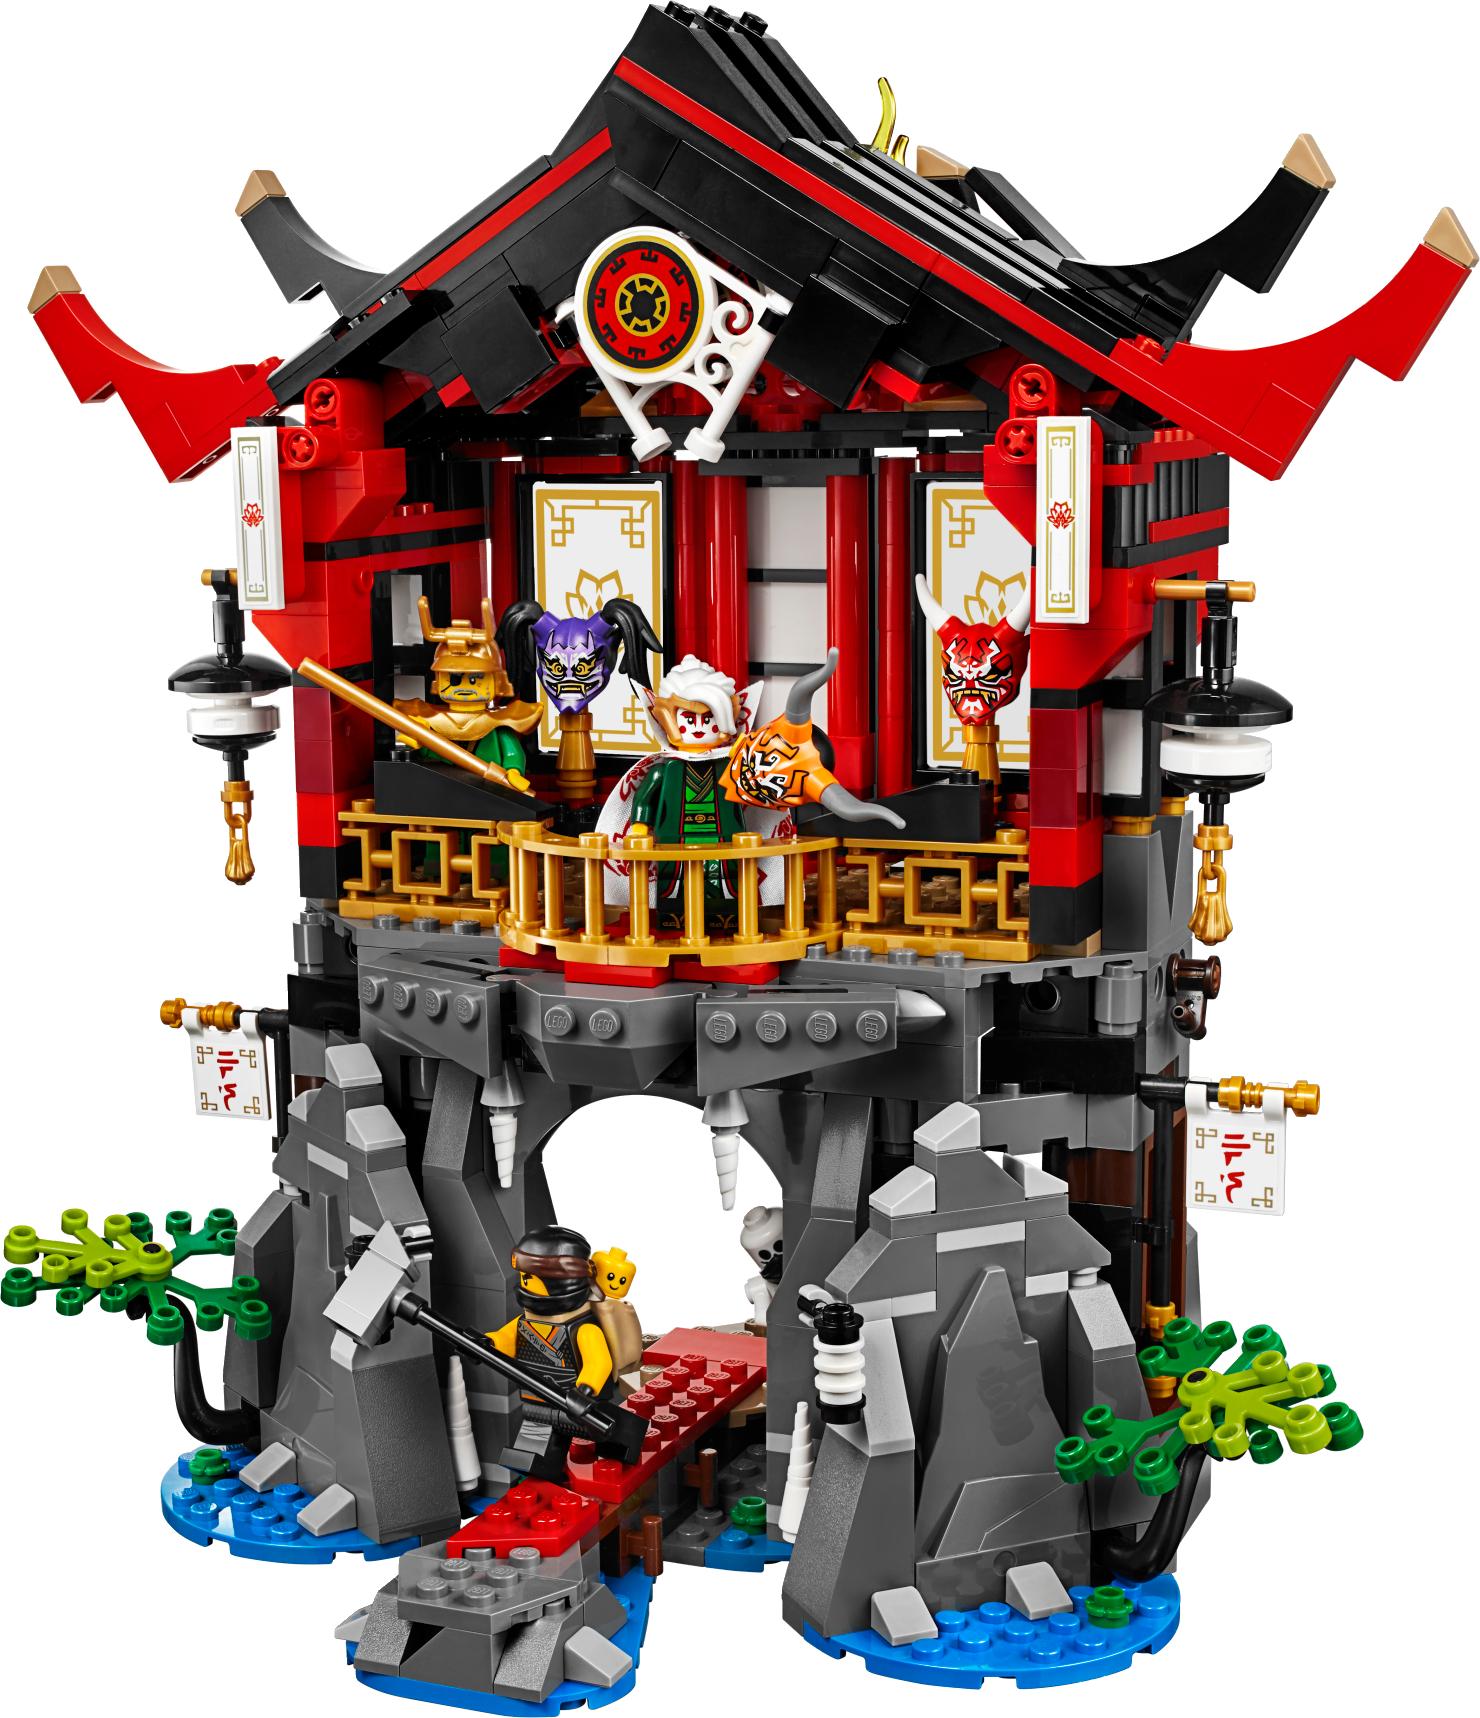 Temple of Resurrection